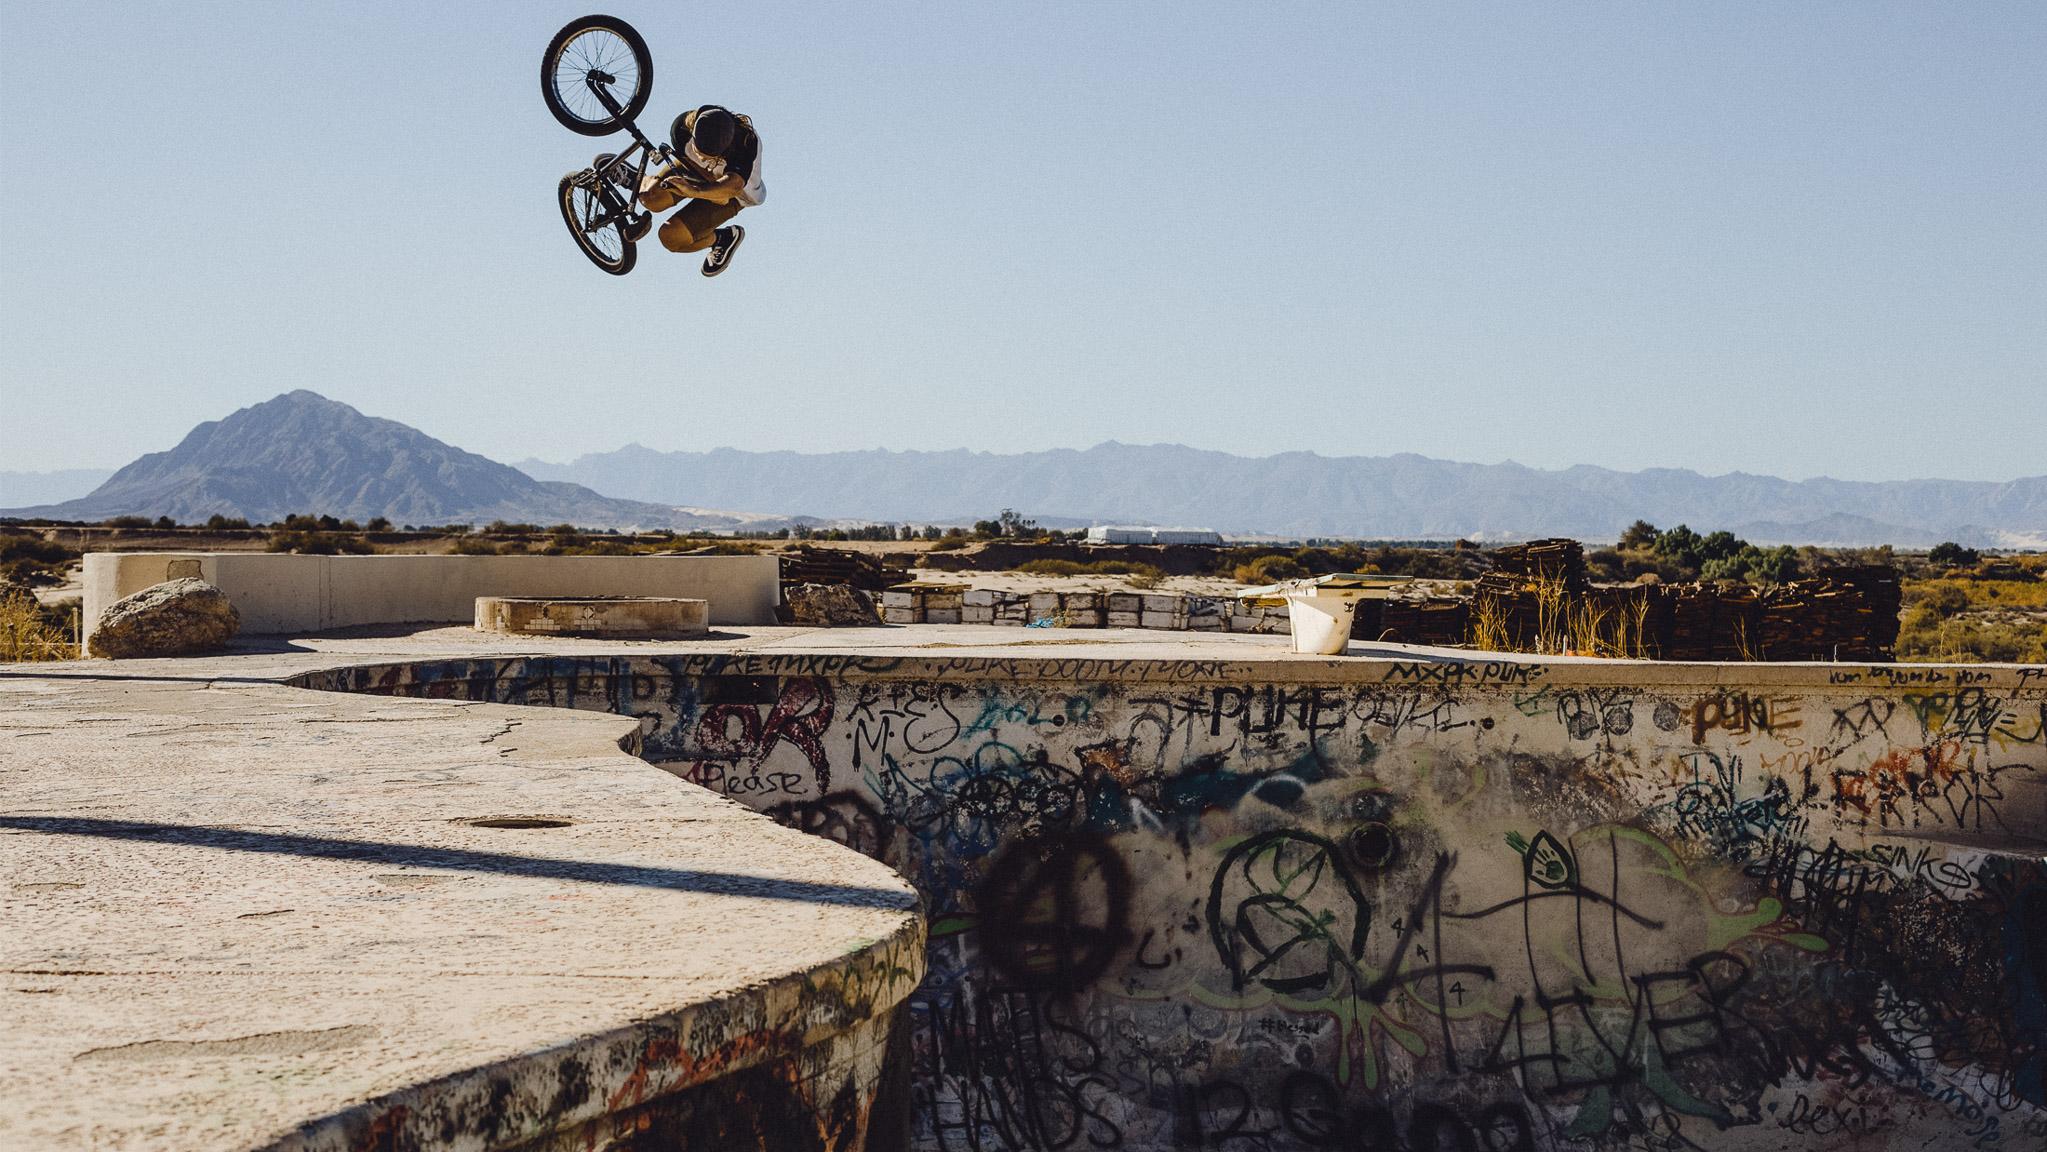 Jason Watts, San Diego, California